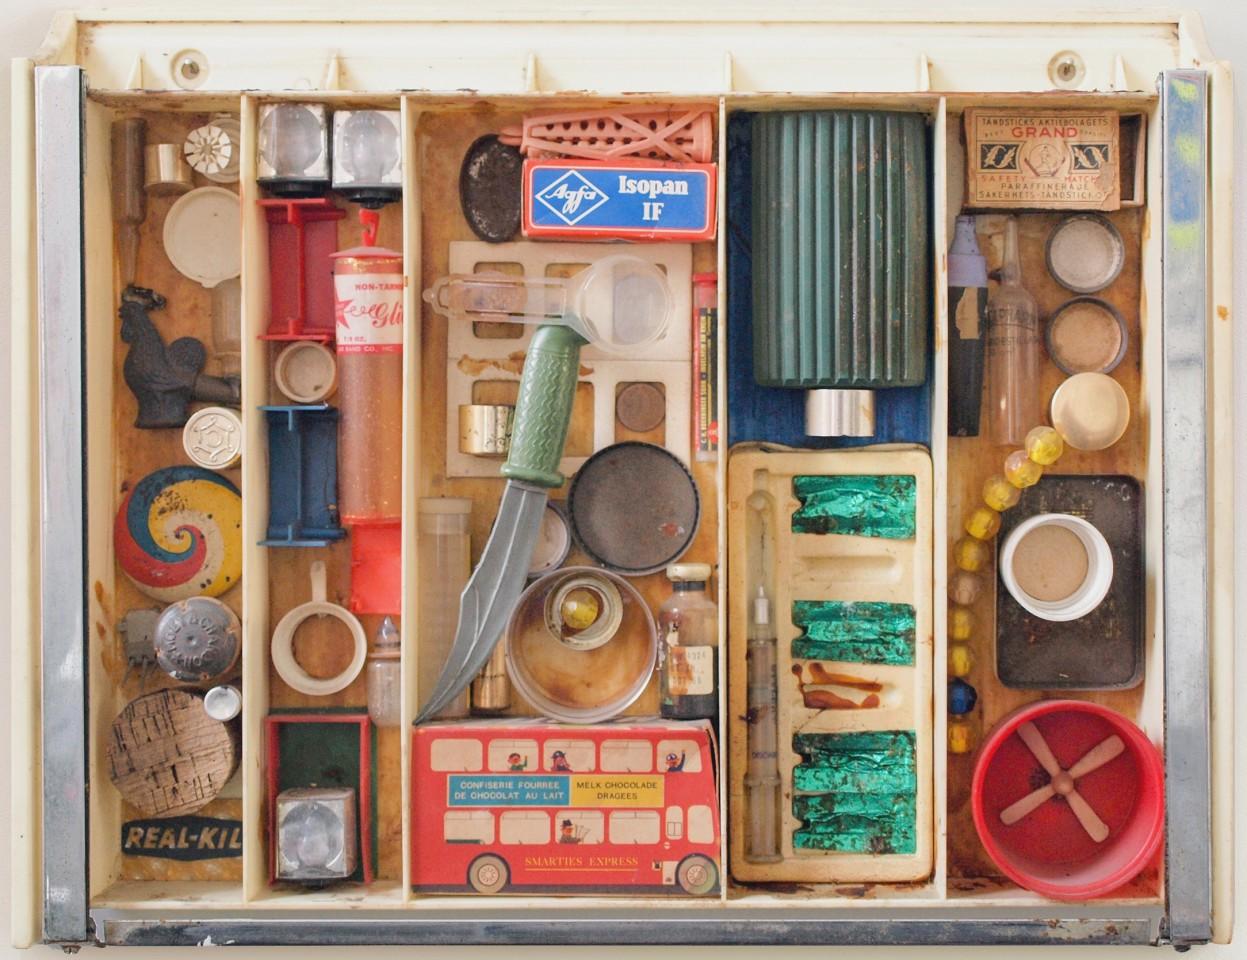 JAN HENDERIKSE, Untitled, c. 1965  Mixed media in plastic showcase  13 1/4 x 17 inches  (33.4 x 43 cm)